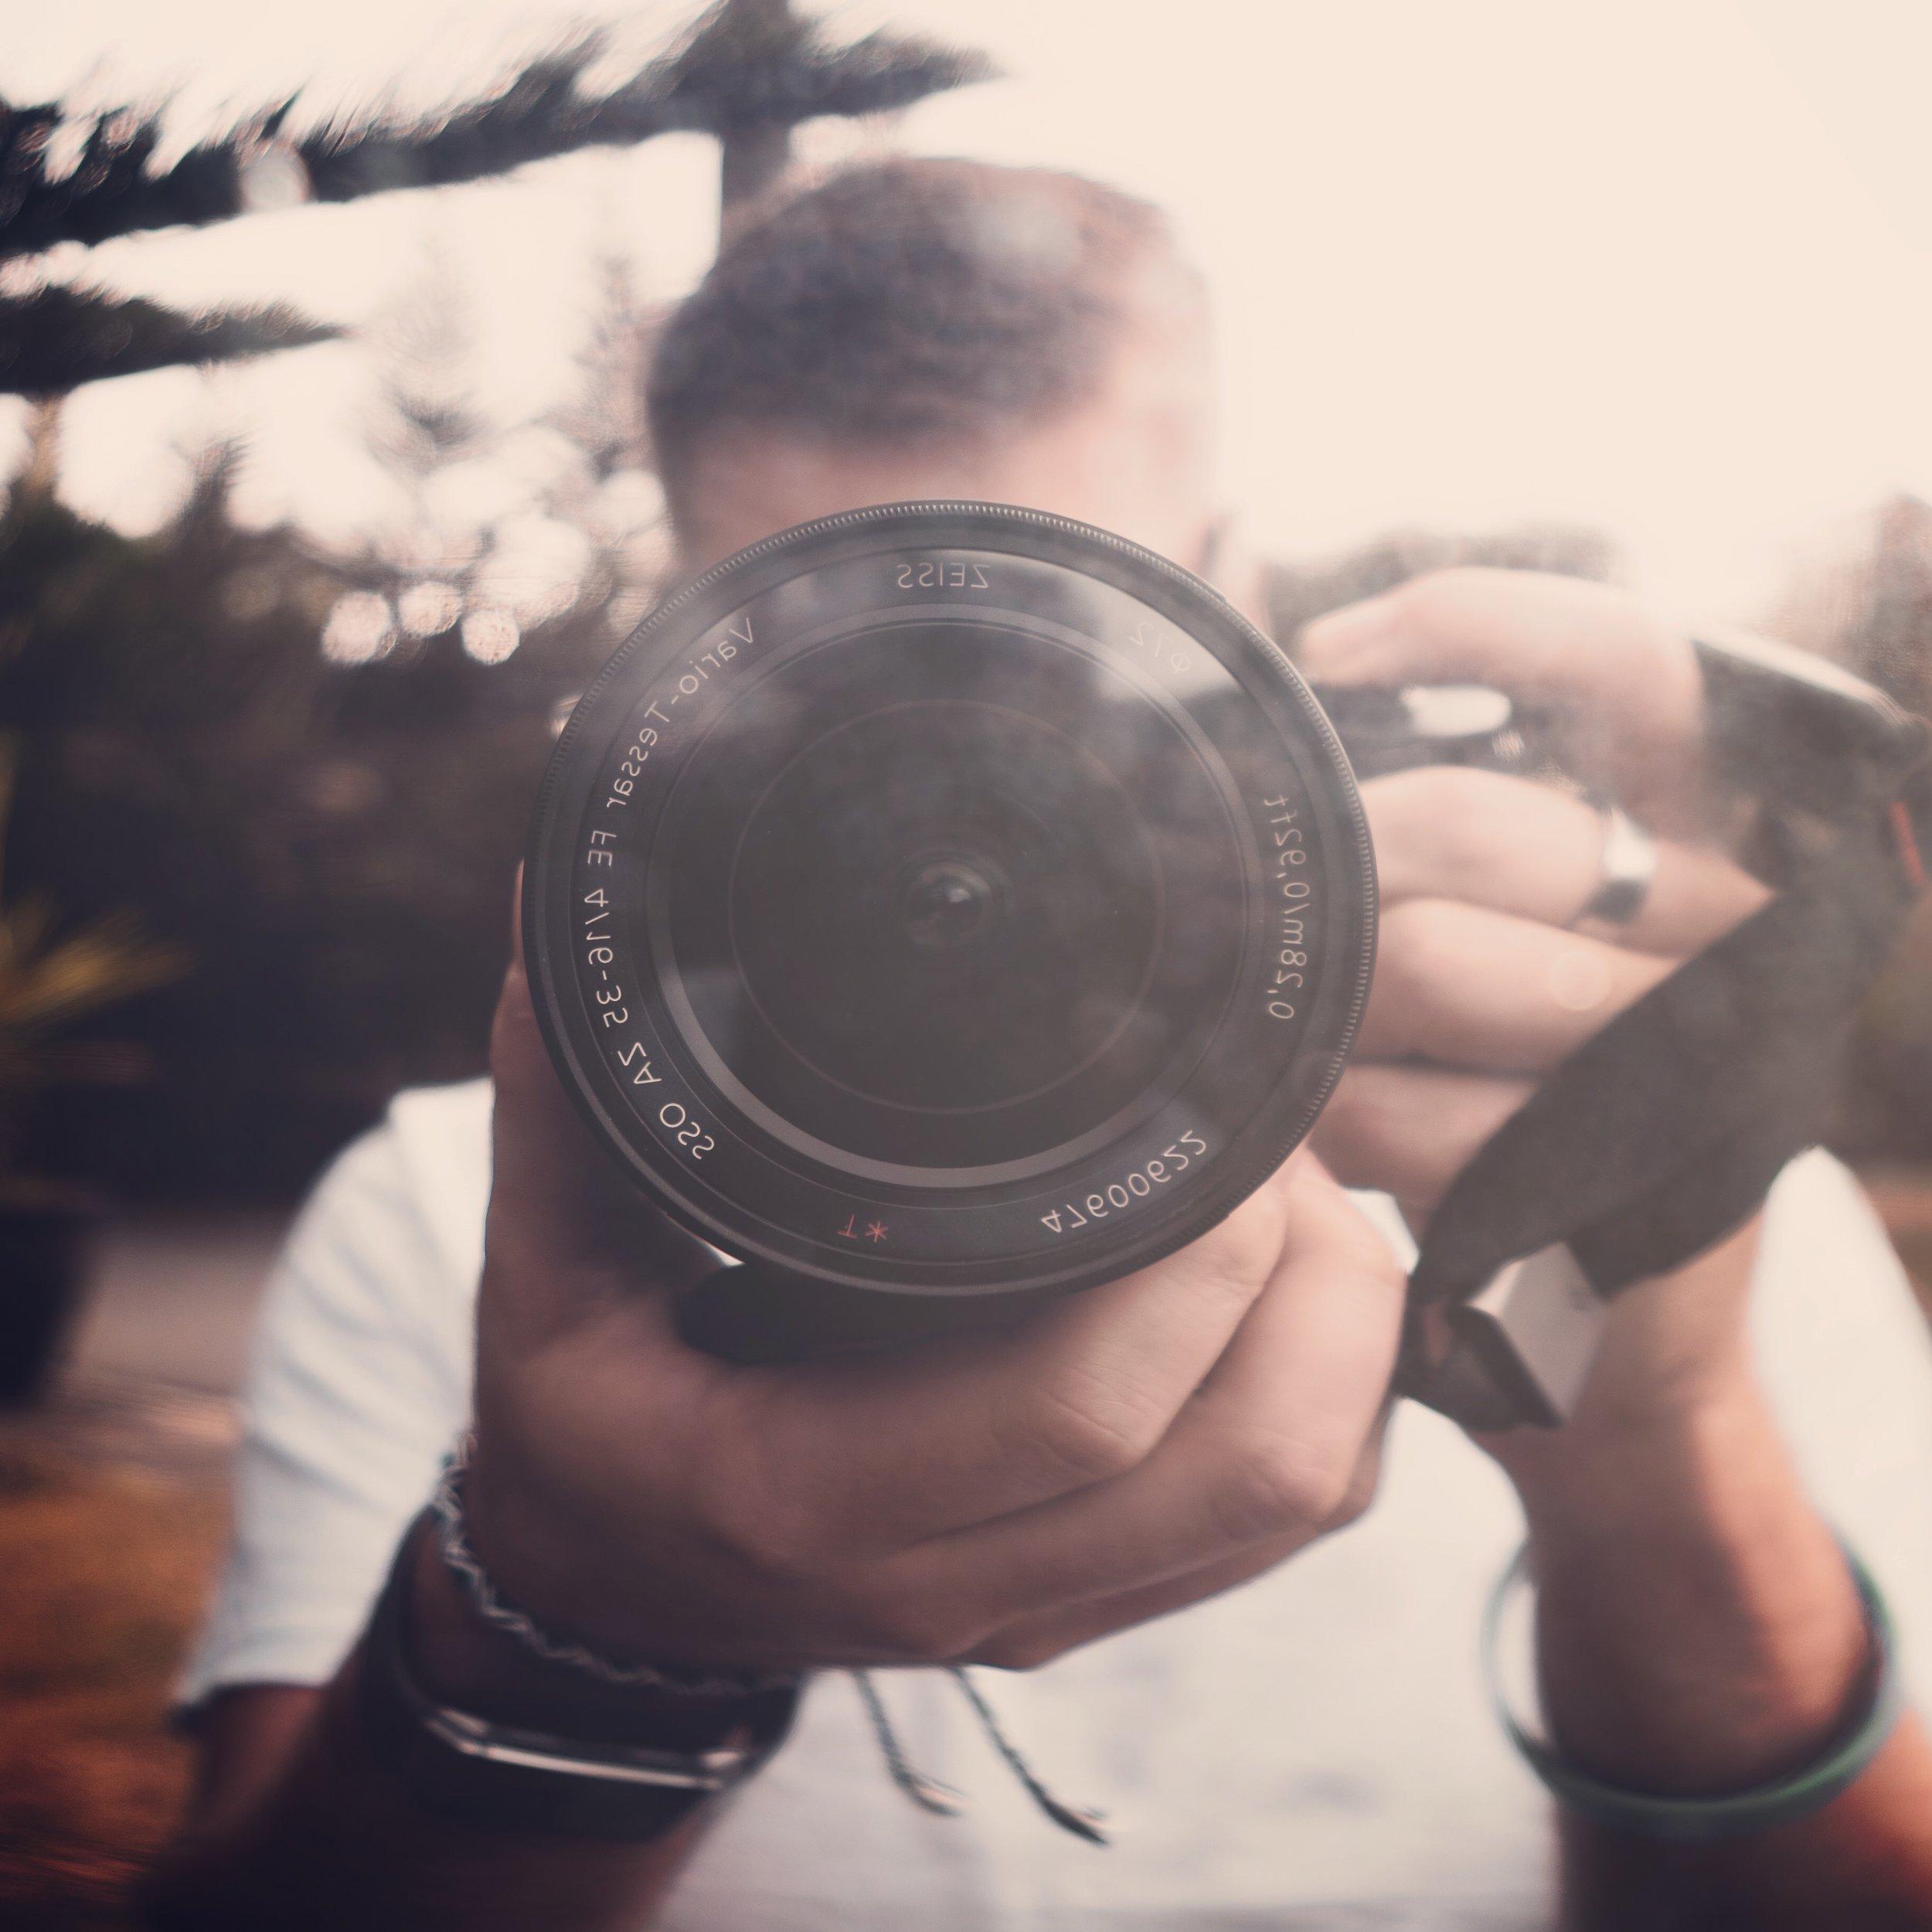 A photo of Sam taking a photo of Sam taking a photo